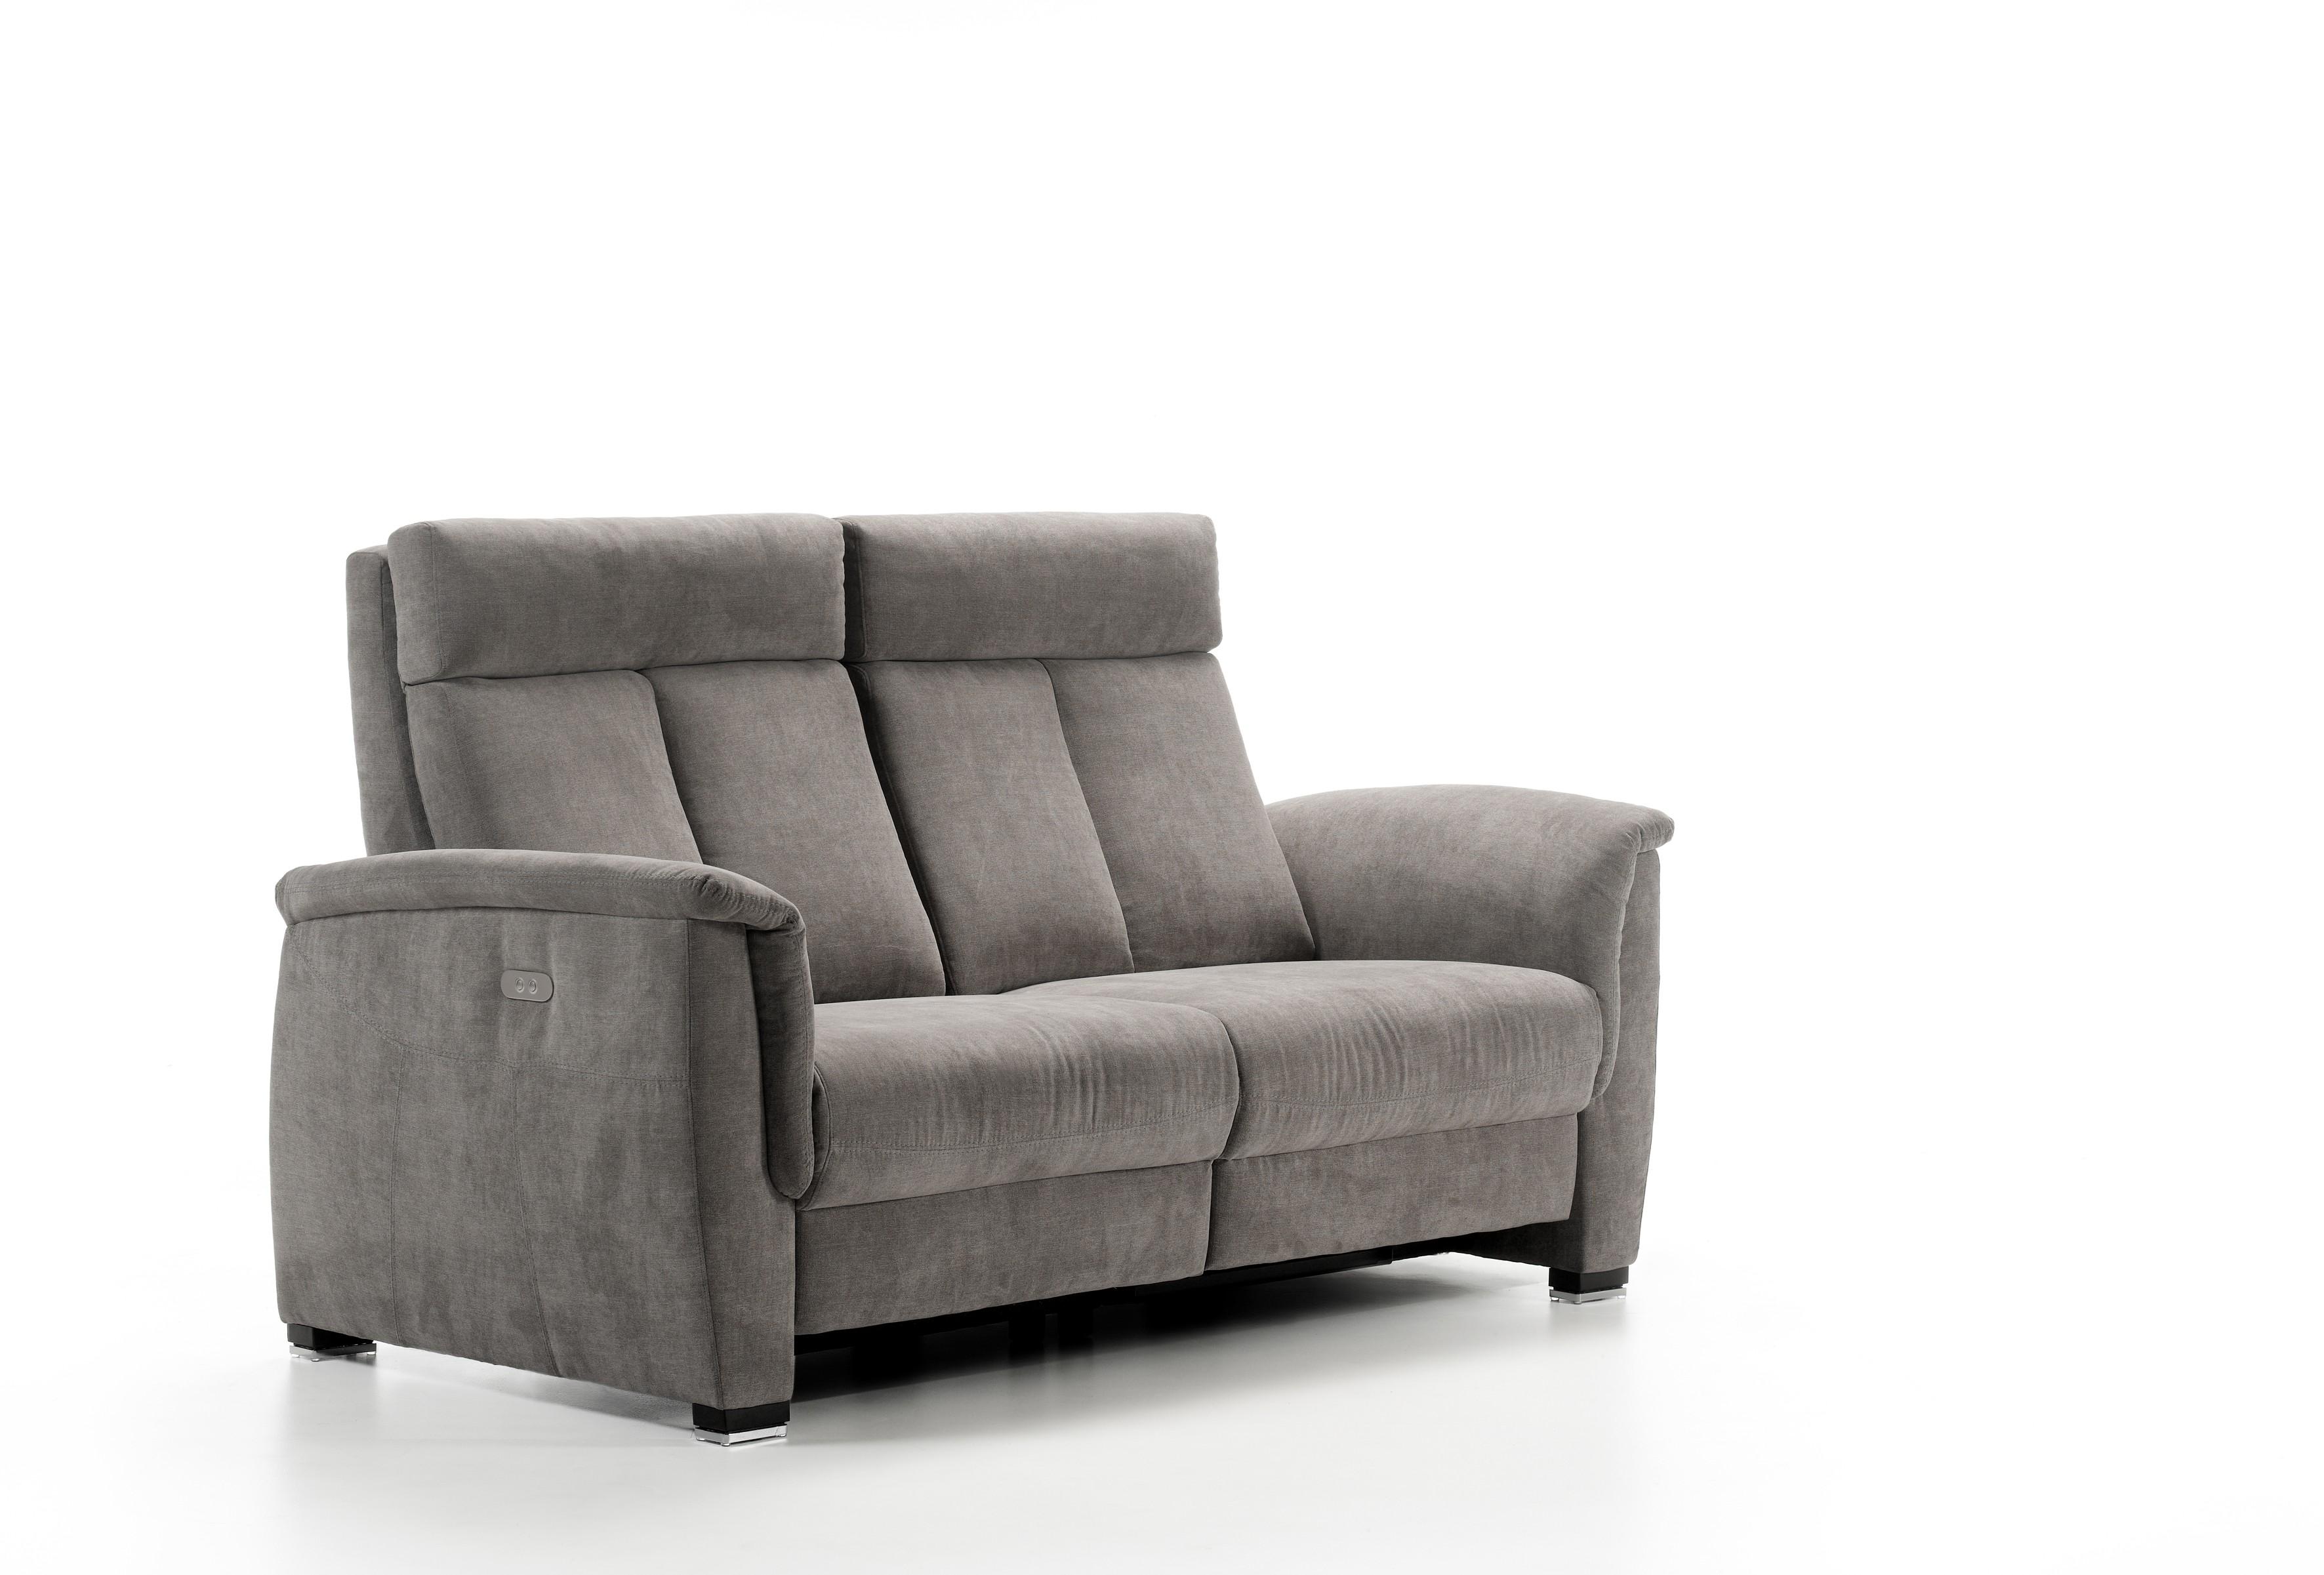 Helios Leather Sofa | Rom | Made In Belgium